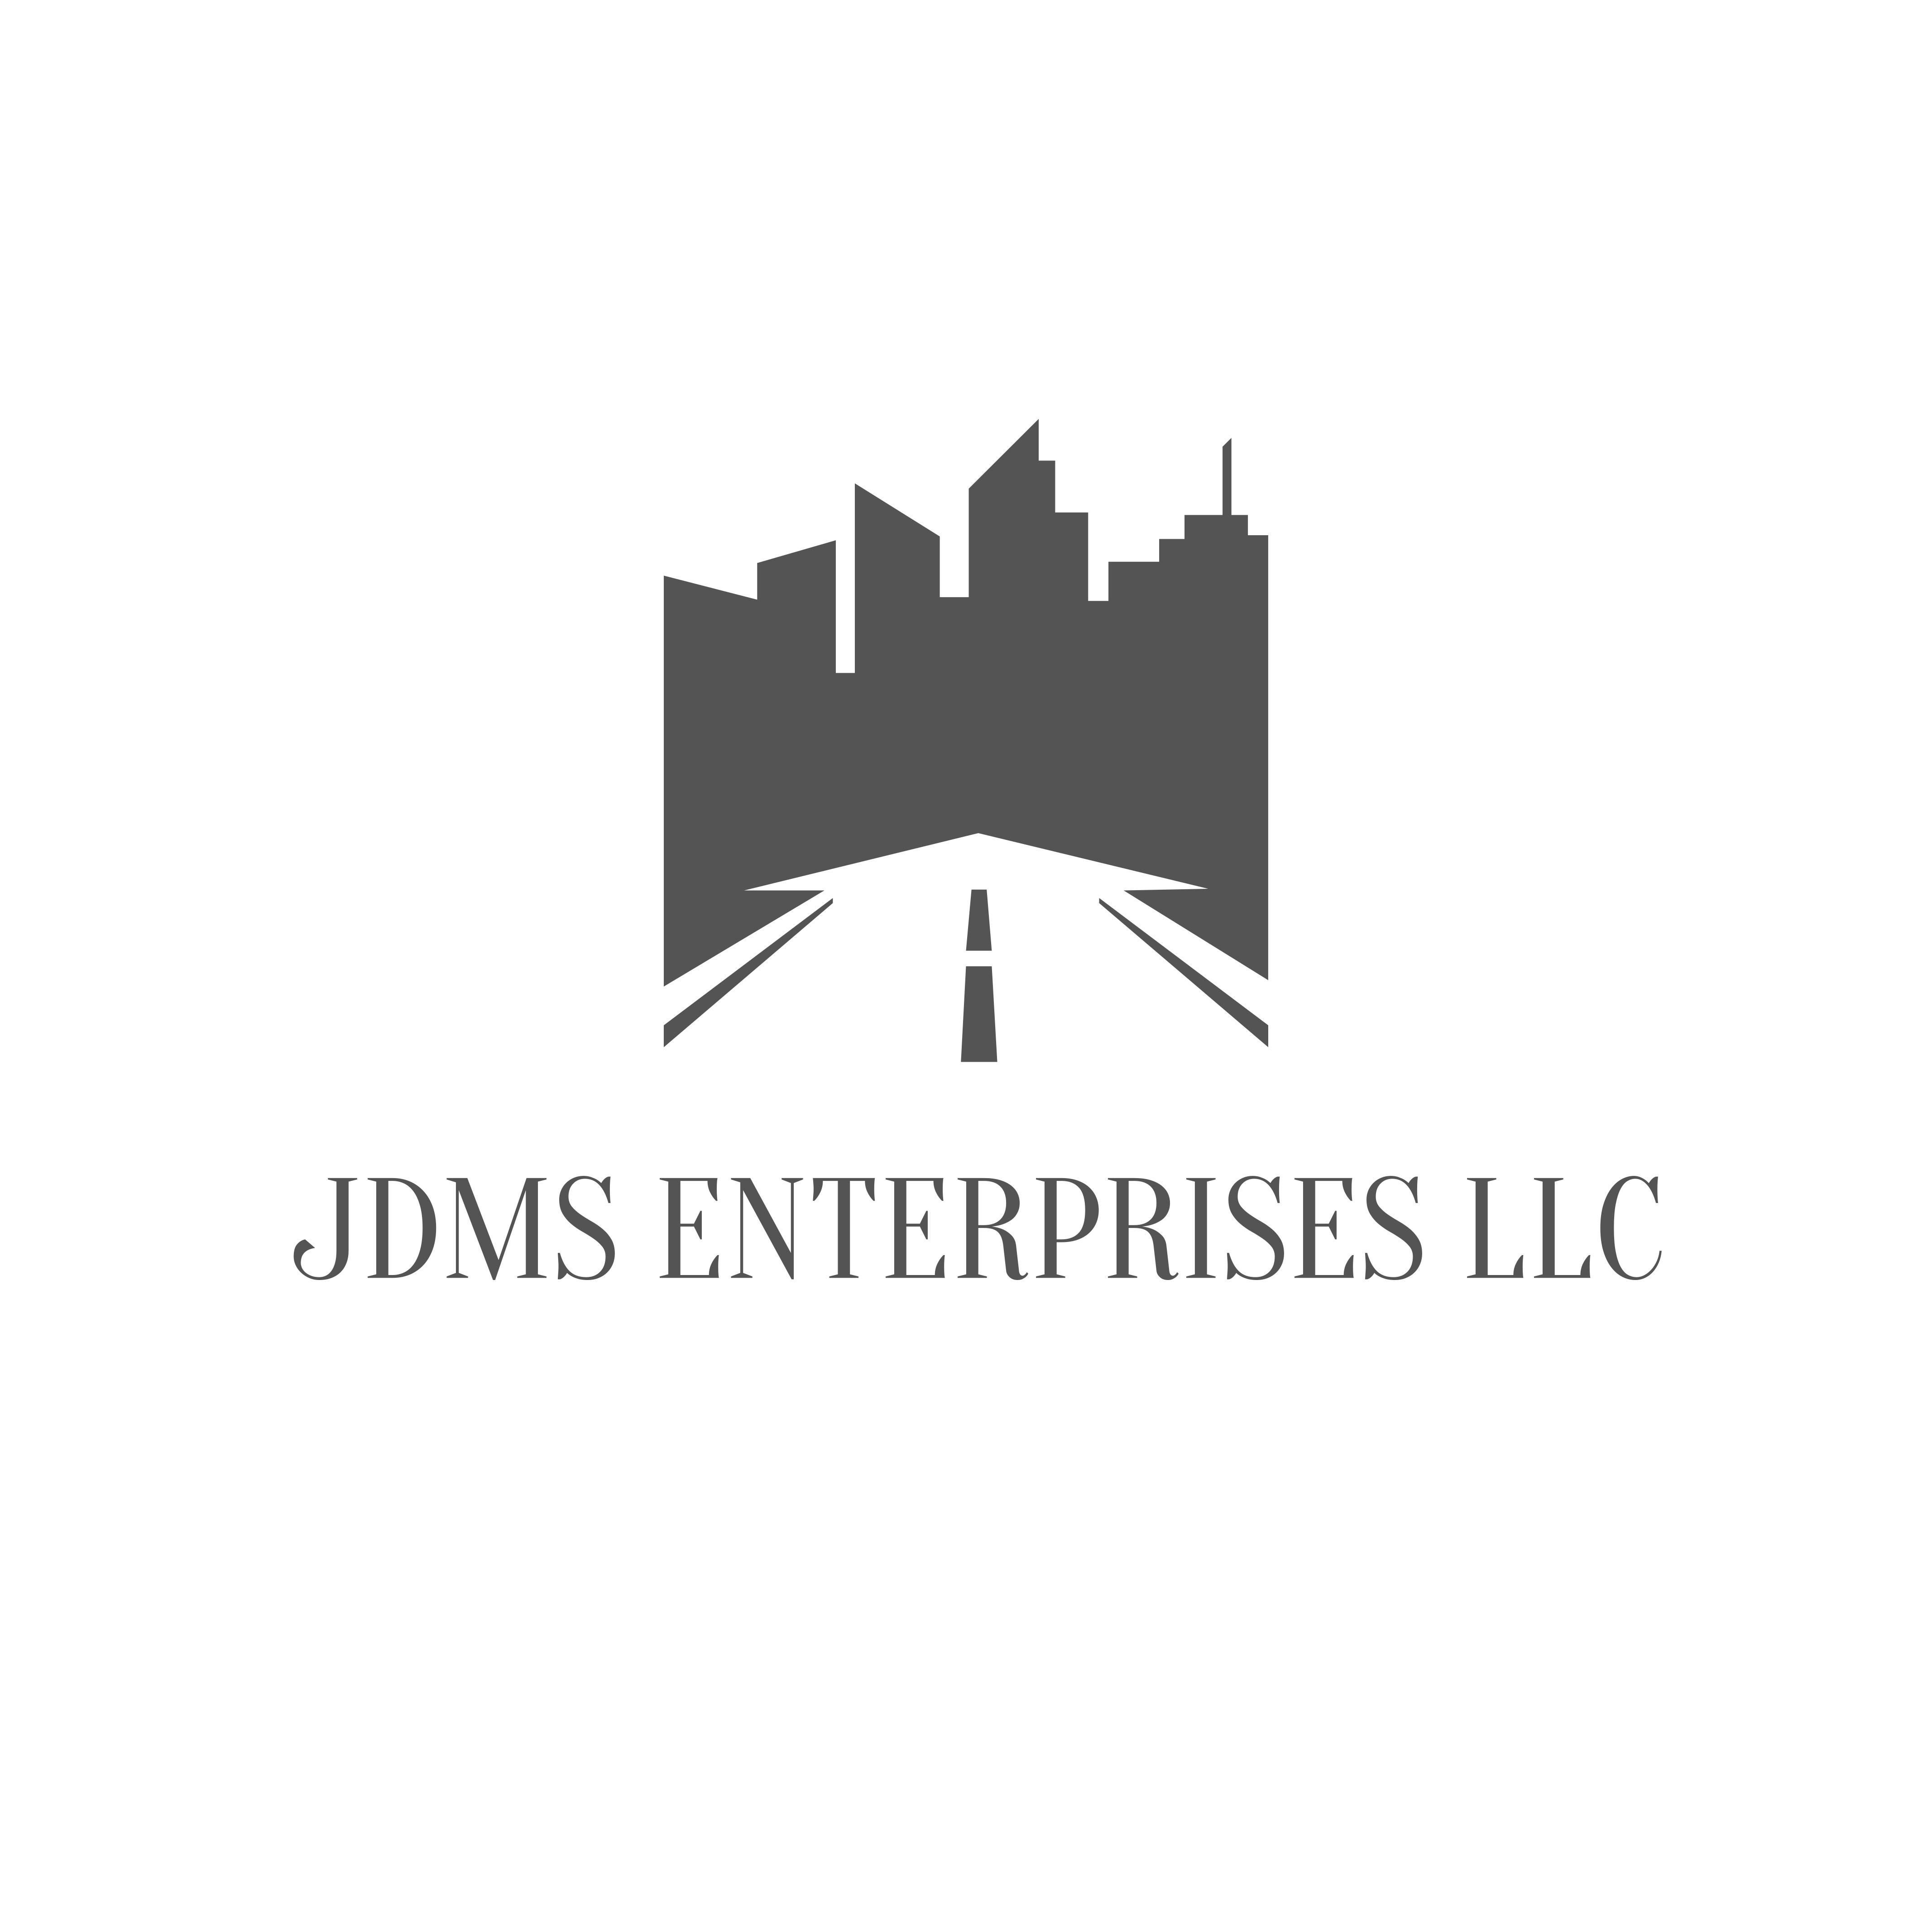 JDMS ENTERPRISES LLC